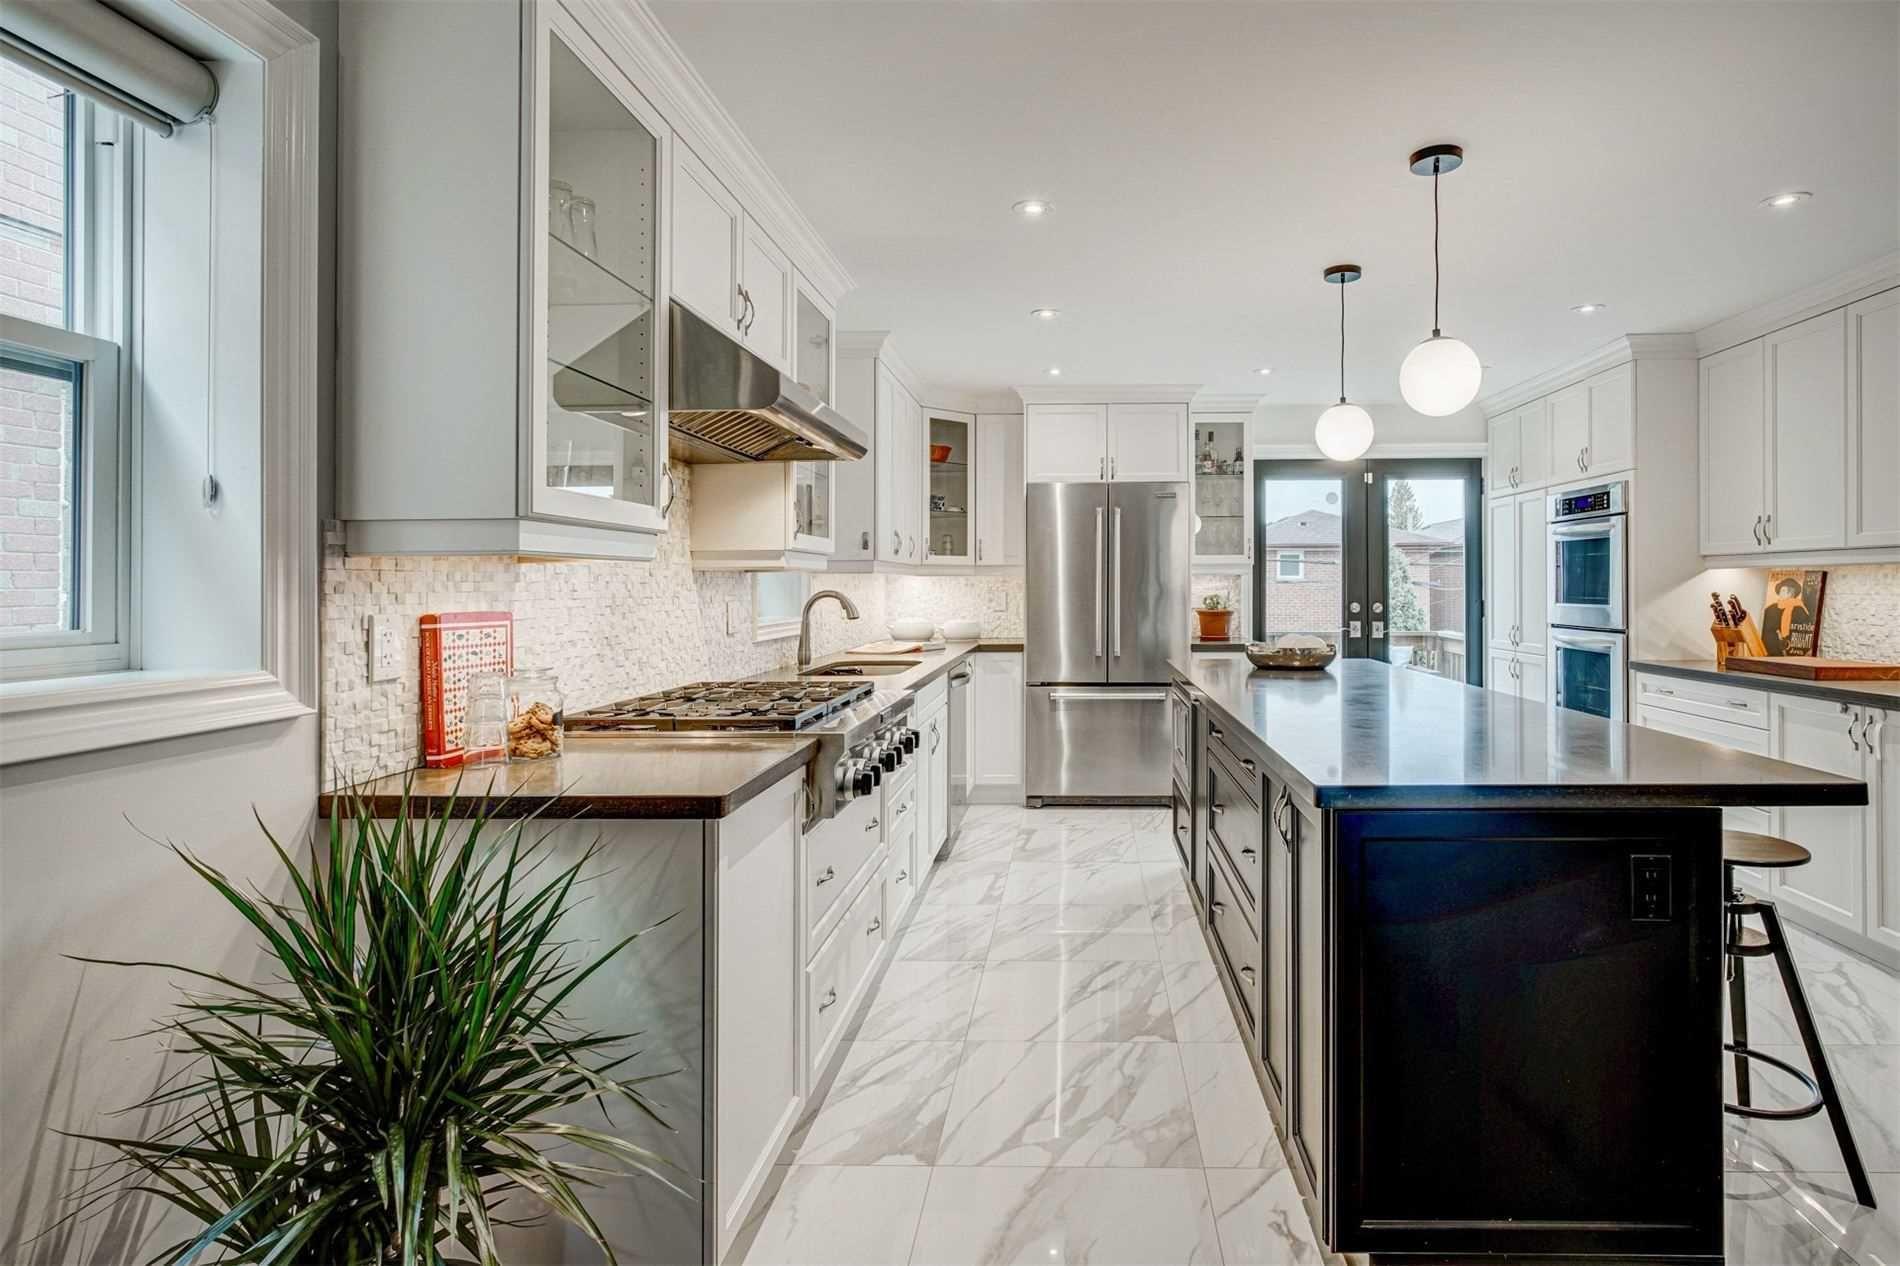 Photo 11: Photos: 92 Holborne Avenue in Toronto: Danforth Village-East York House (2-Storey) for sale (Toronto E03)  : MLS®# E5204452